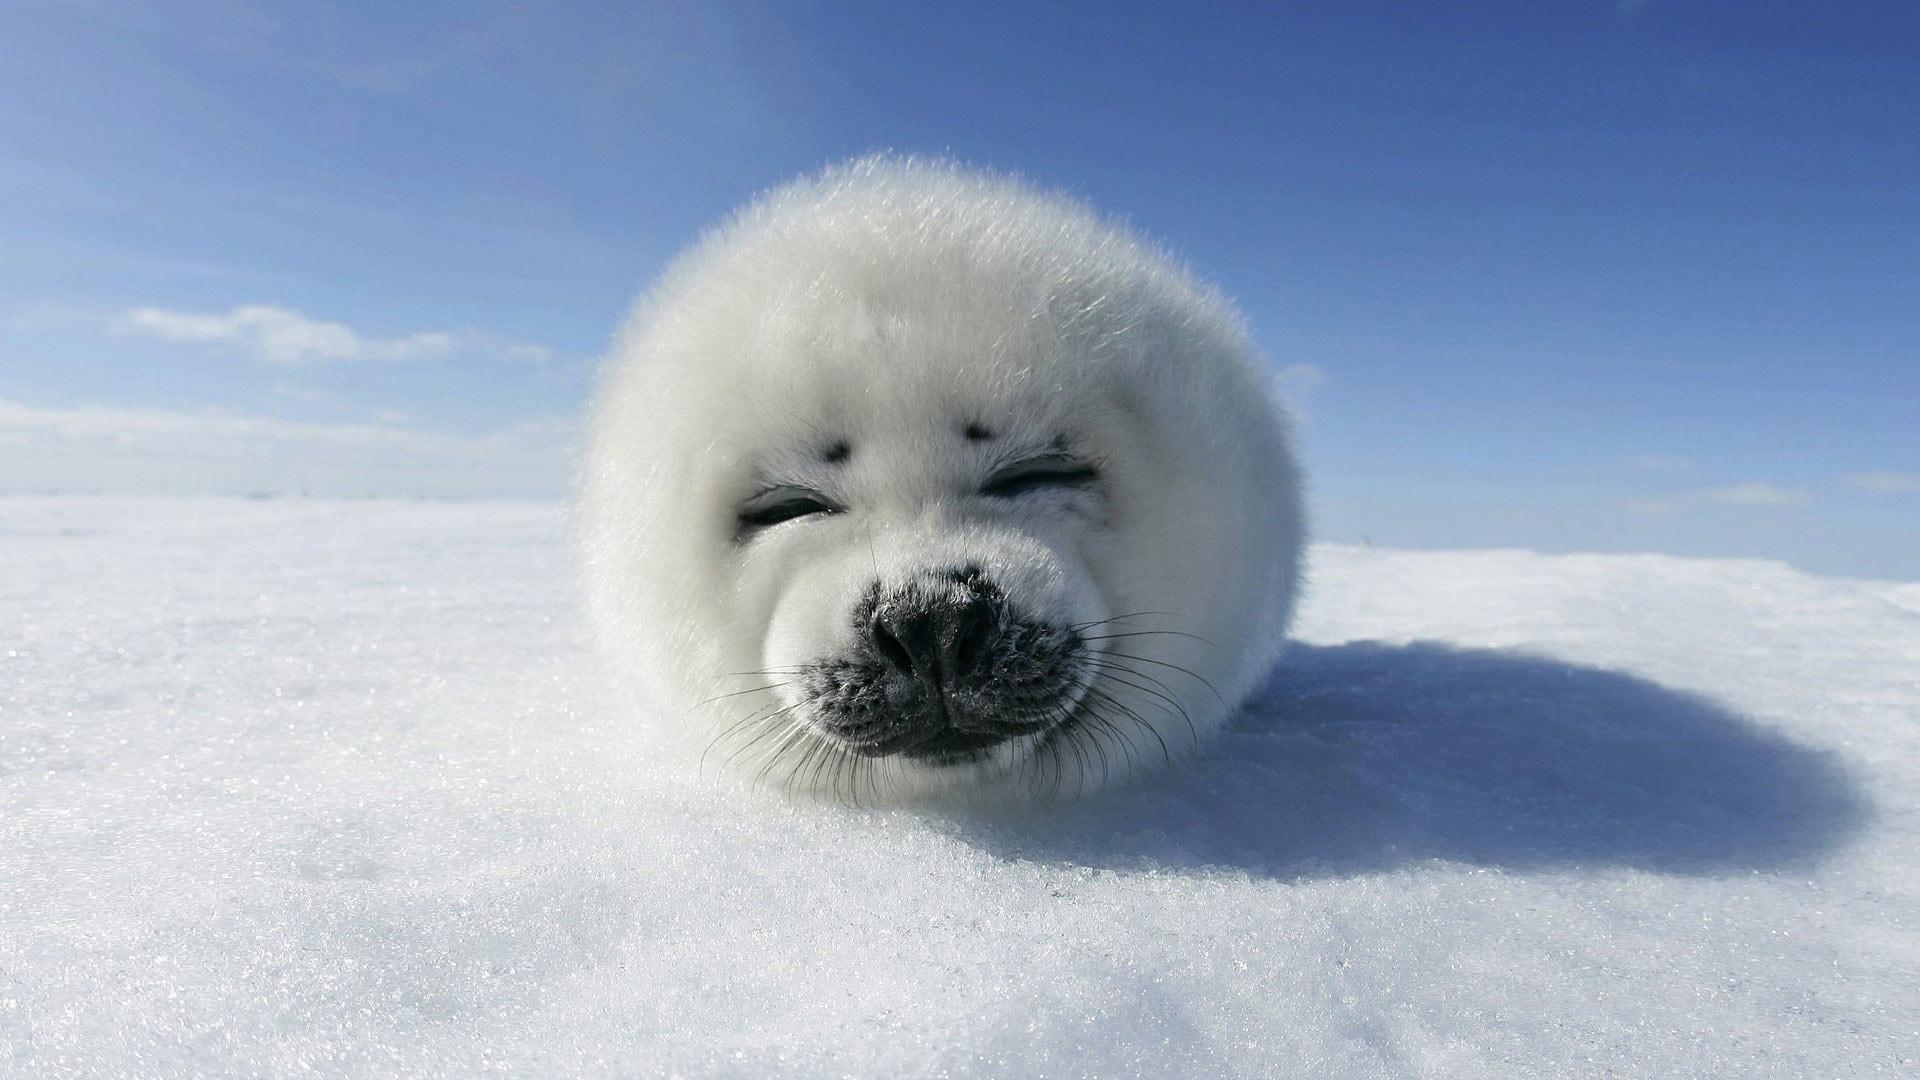 Desktop-wallpaper-animals-baby-seal-canadian-seal.jpg